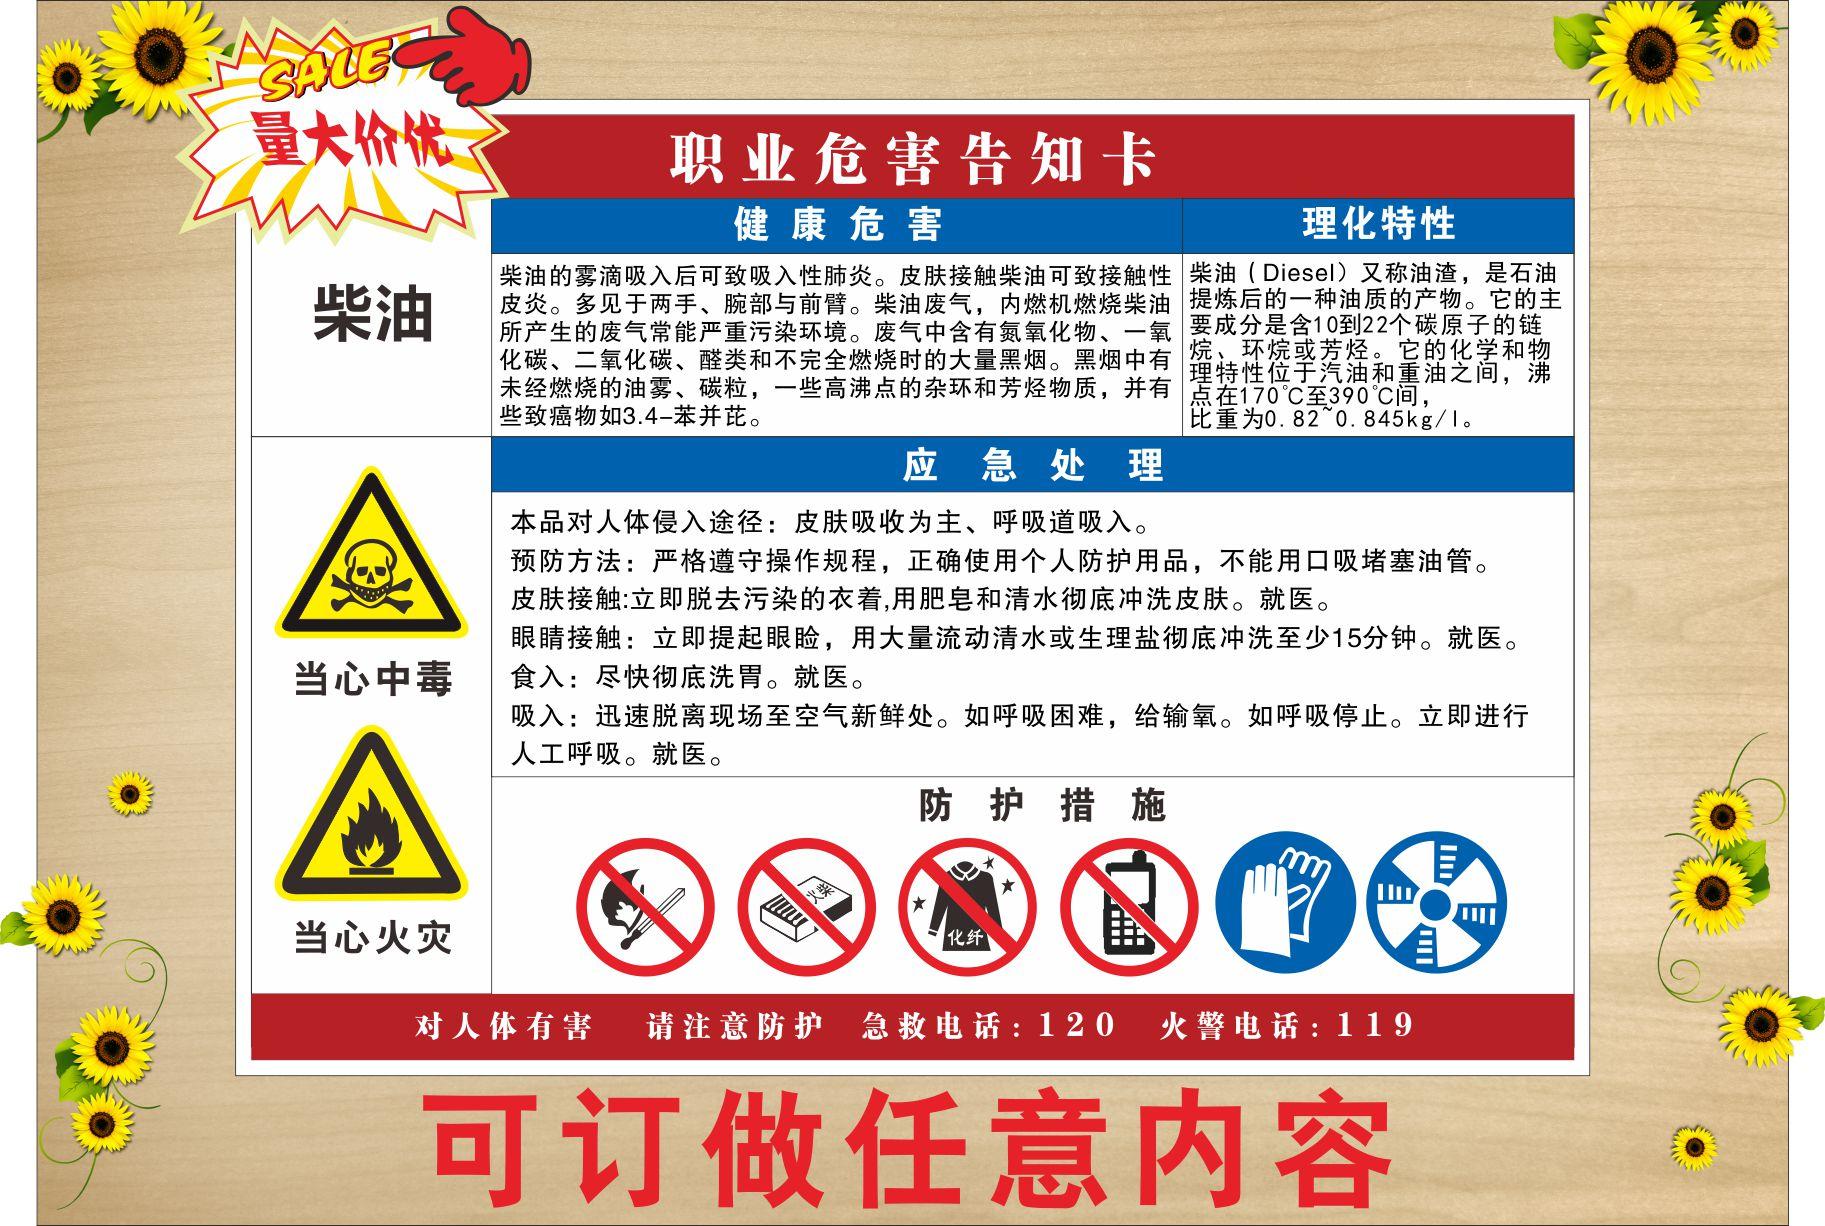 Gasoline occupational hazard notification card chemical hazard awareness card warning board safety warning board v-024